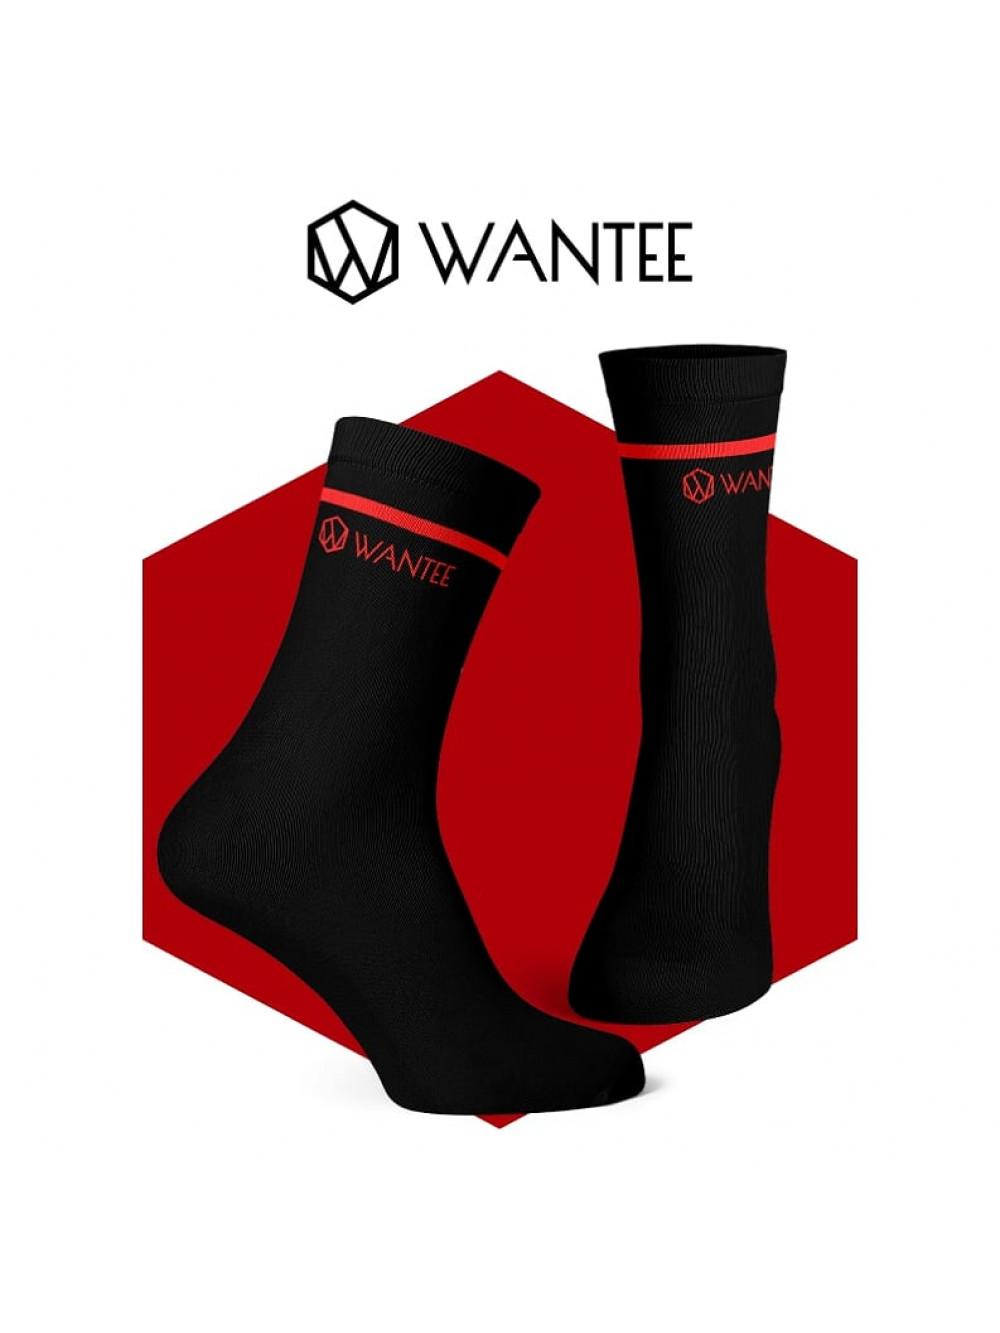 Socken Basic Black and Red Wantee